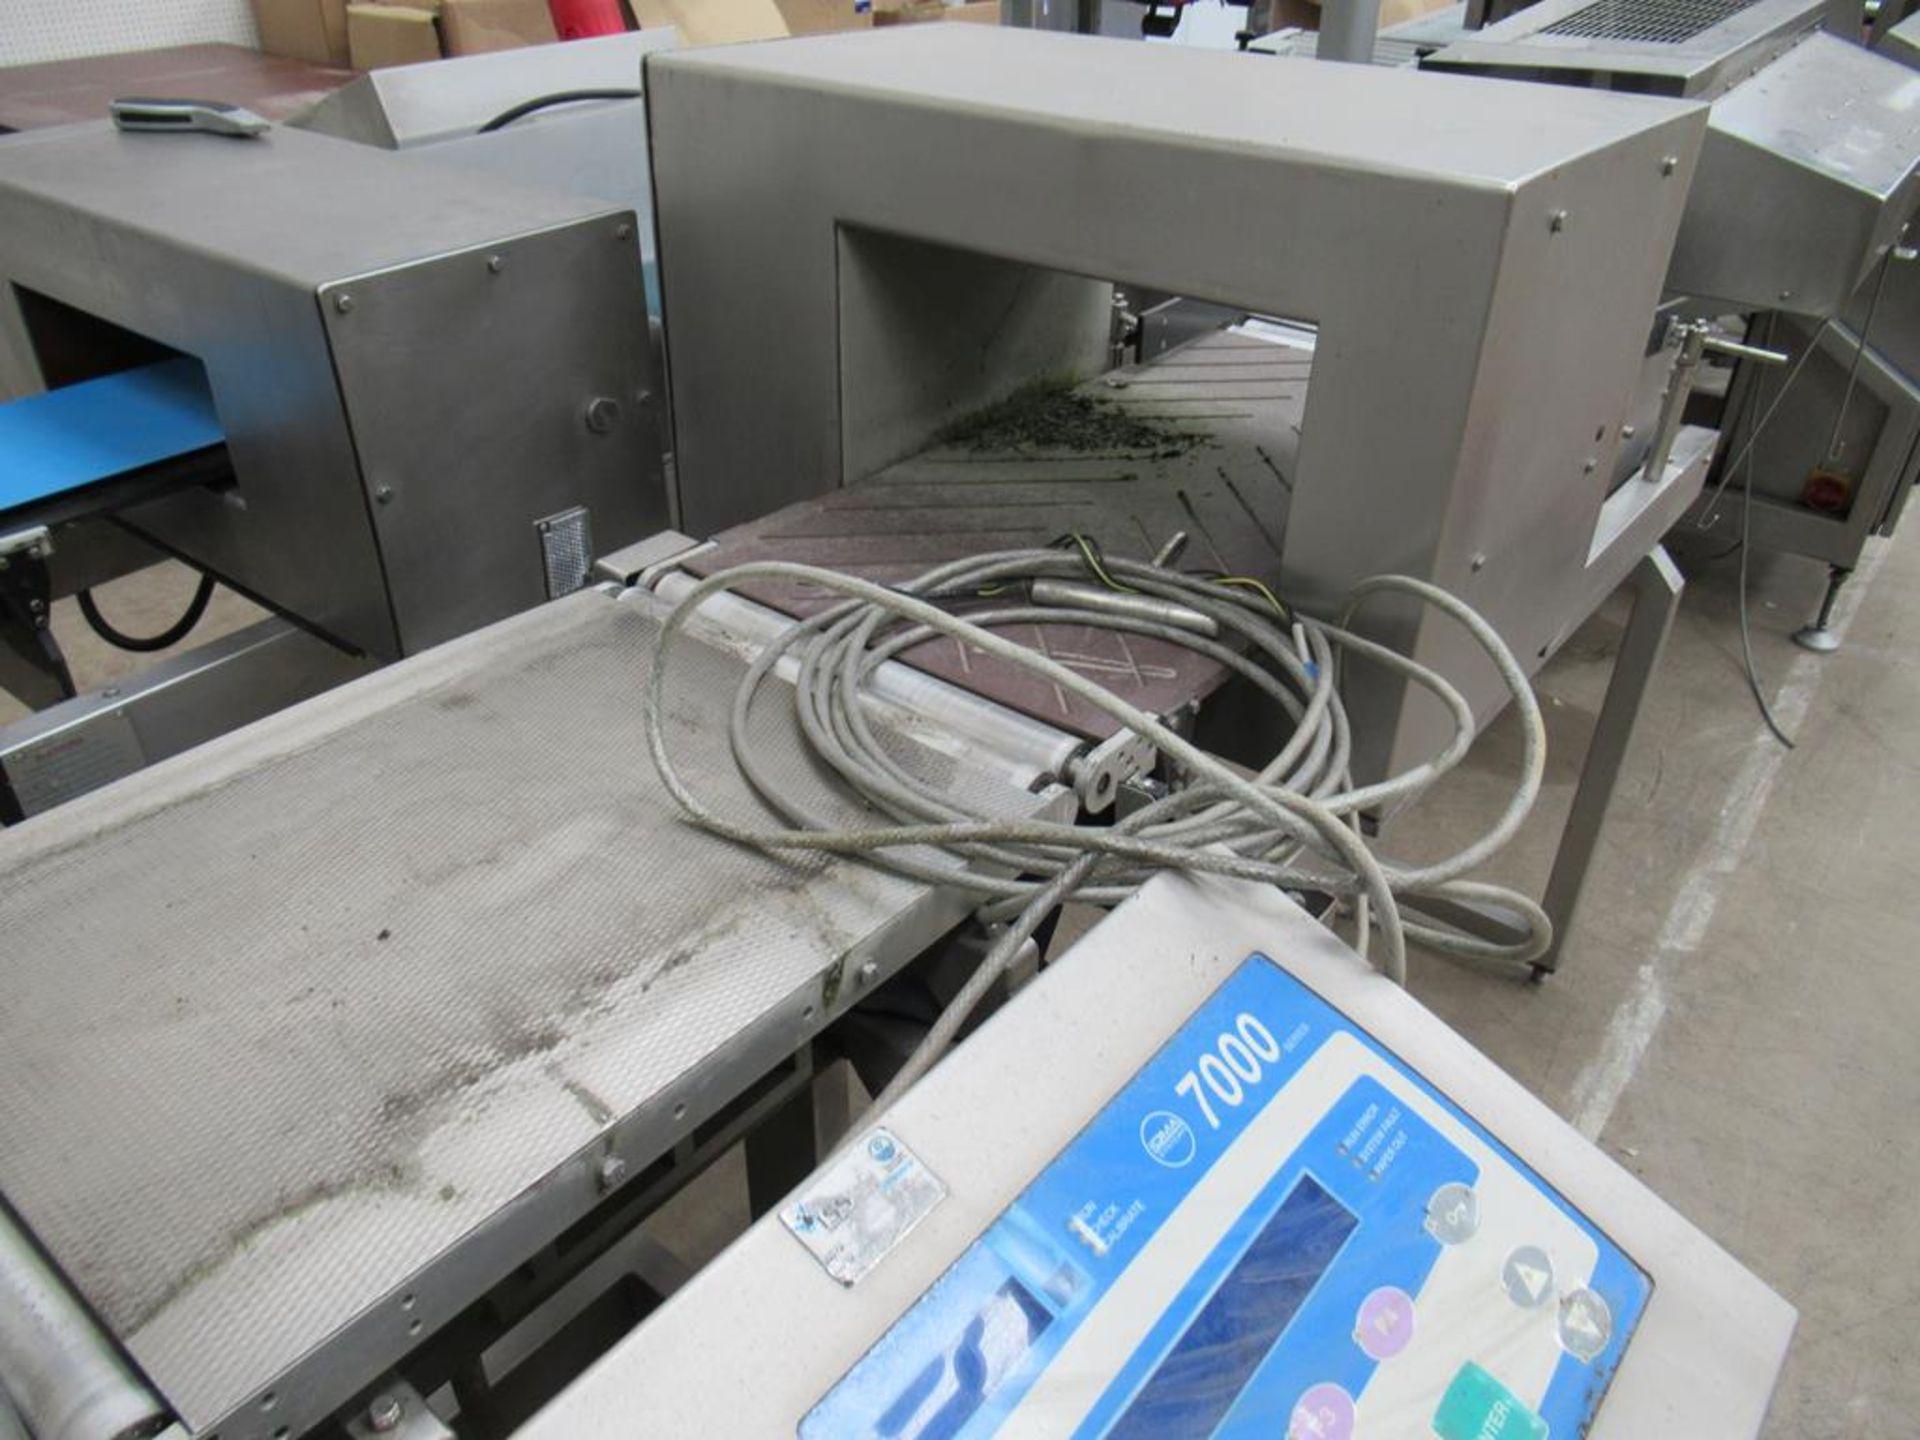 Loma 7000 Metal Detecting Conveyor - Image 3 of 7